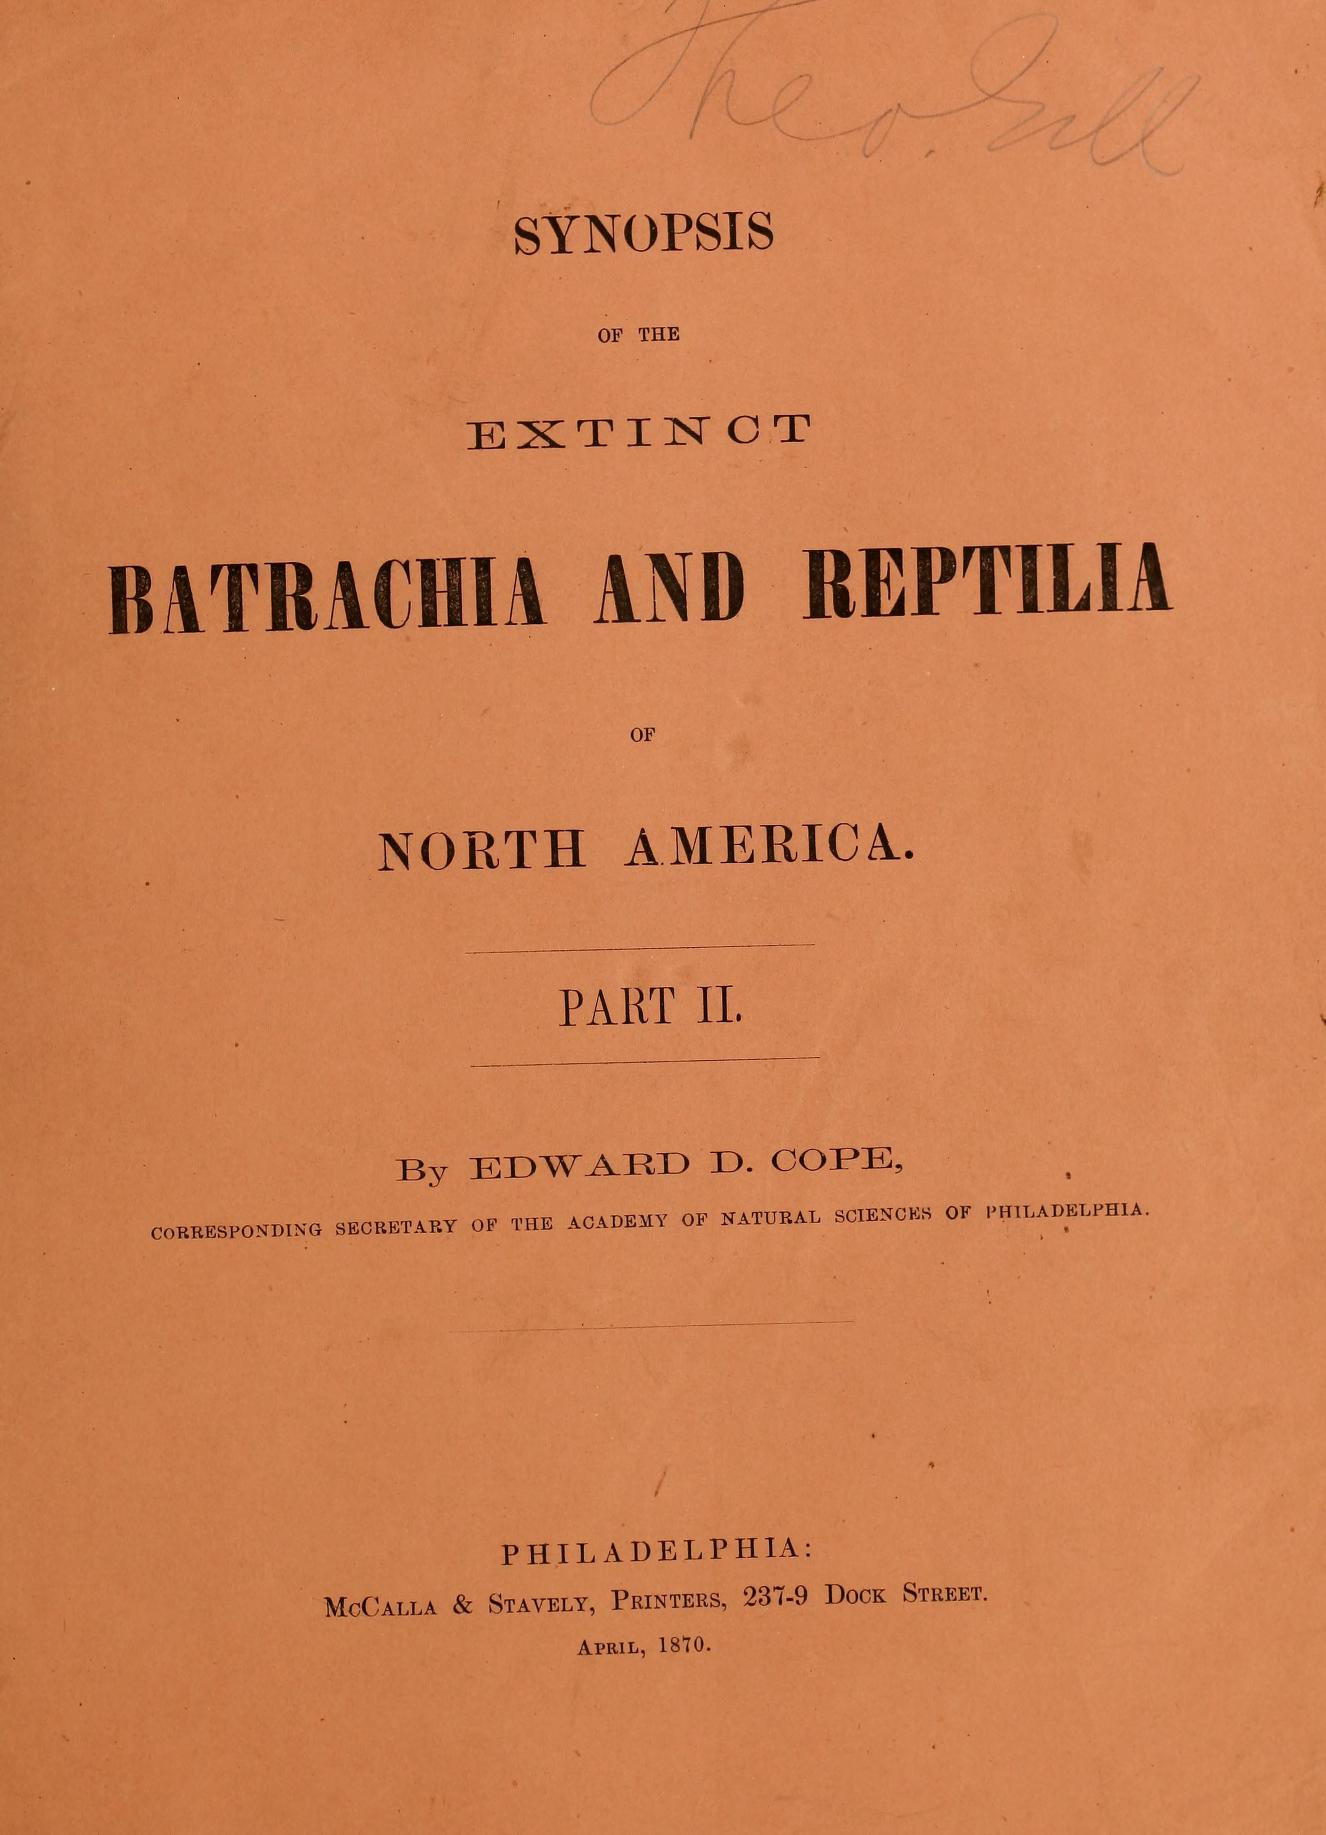 Synopsis of the Extinct Batrachia and Reptilia of North America